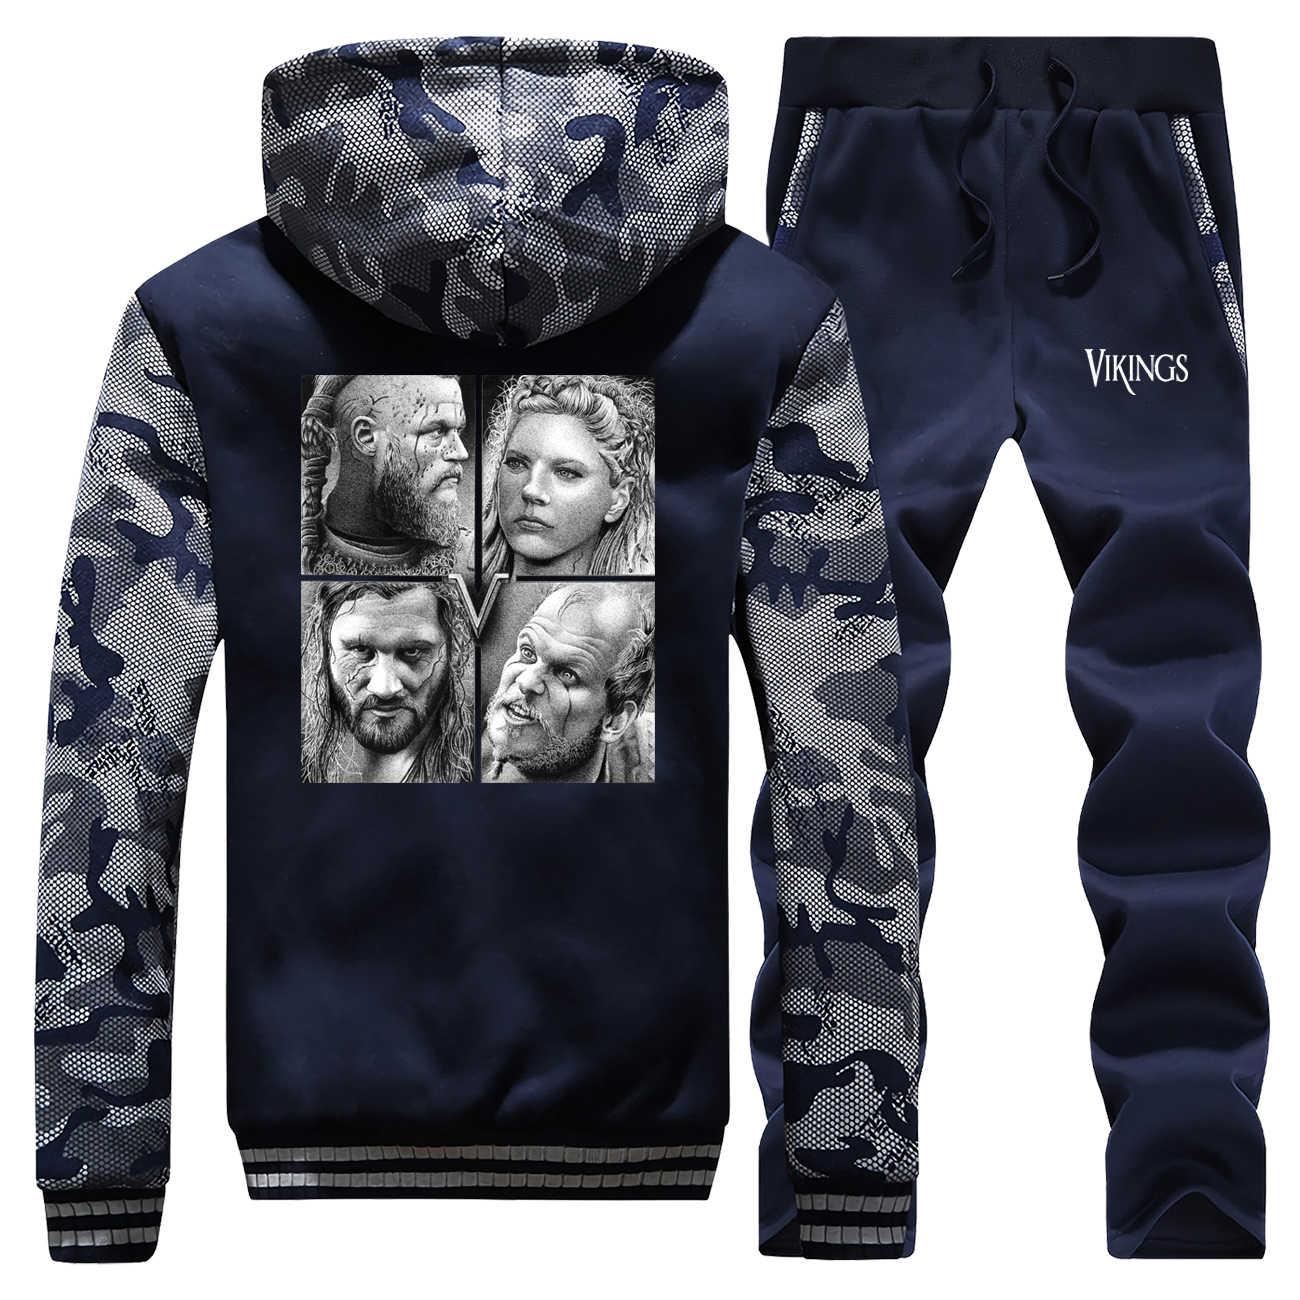 TV Zeigen Vikings Camo Männlichen Set Ragnar Zipper Starke Jakcets 2019 Winter Warme Hosen Sweatshirt Fleece männer Voller Anzug trainingsanzug